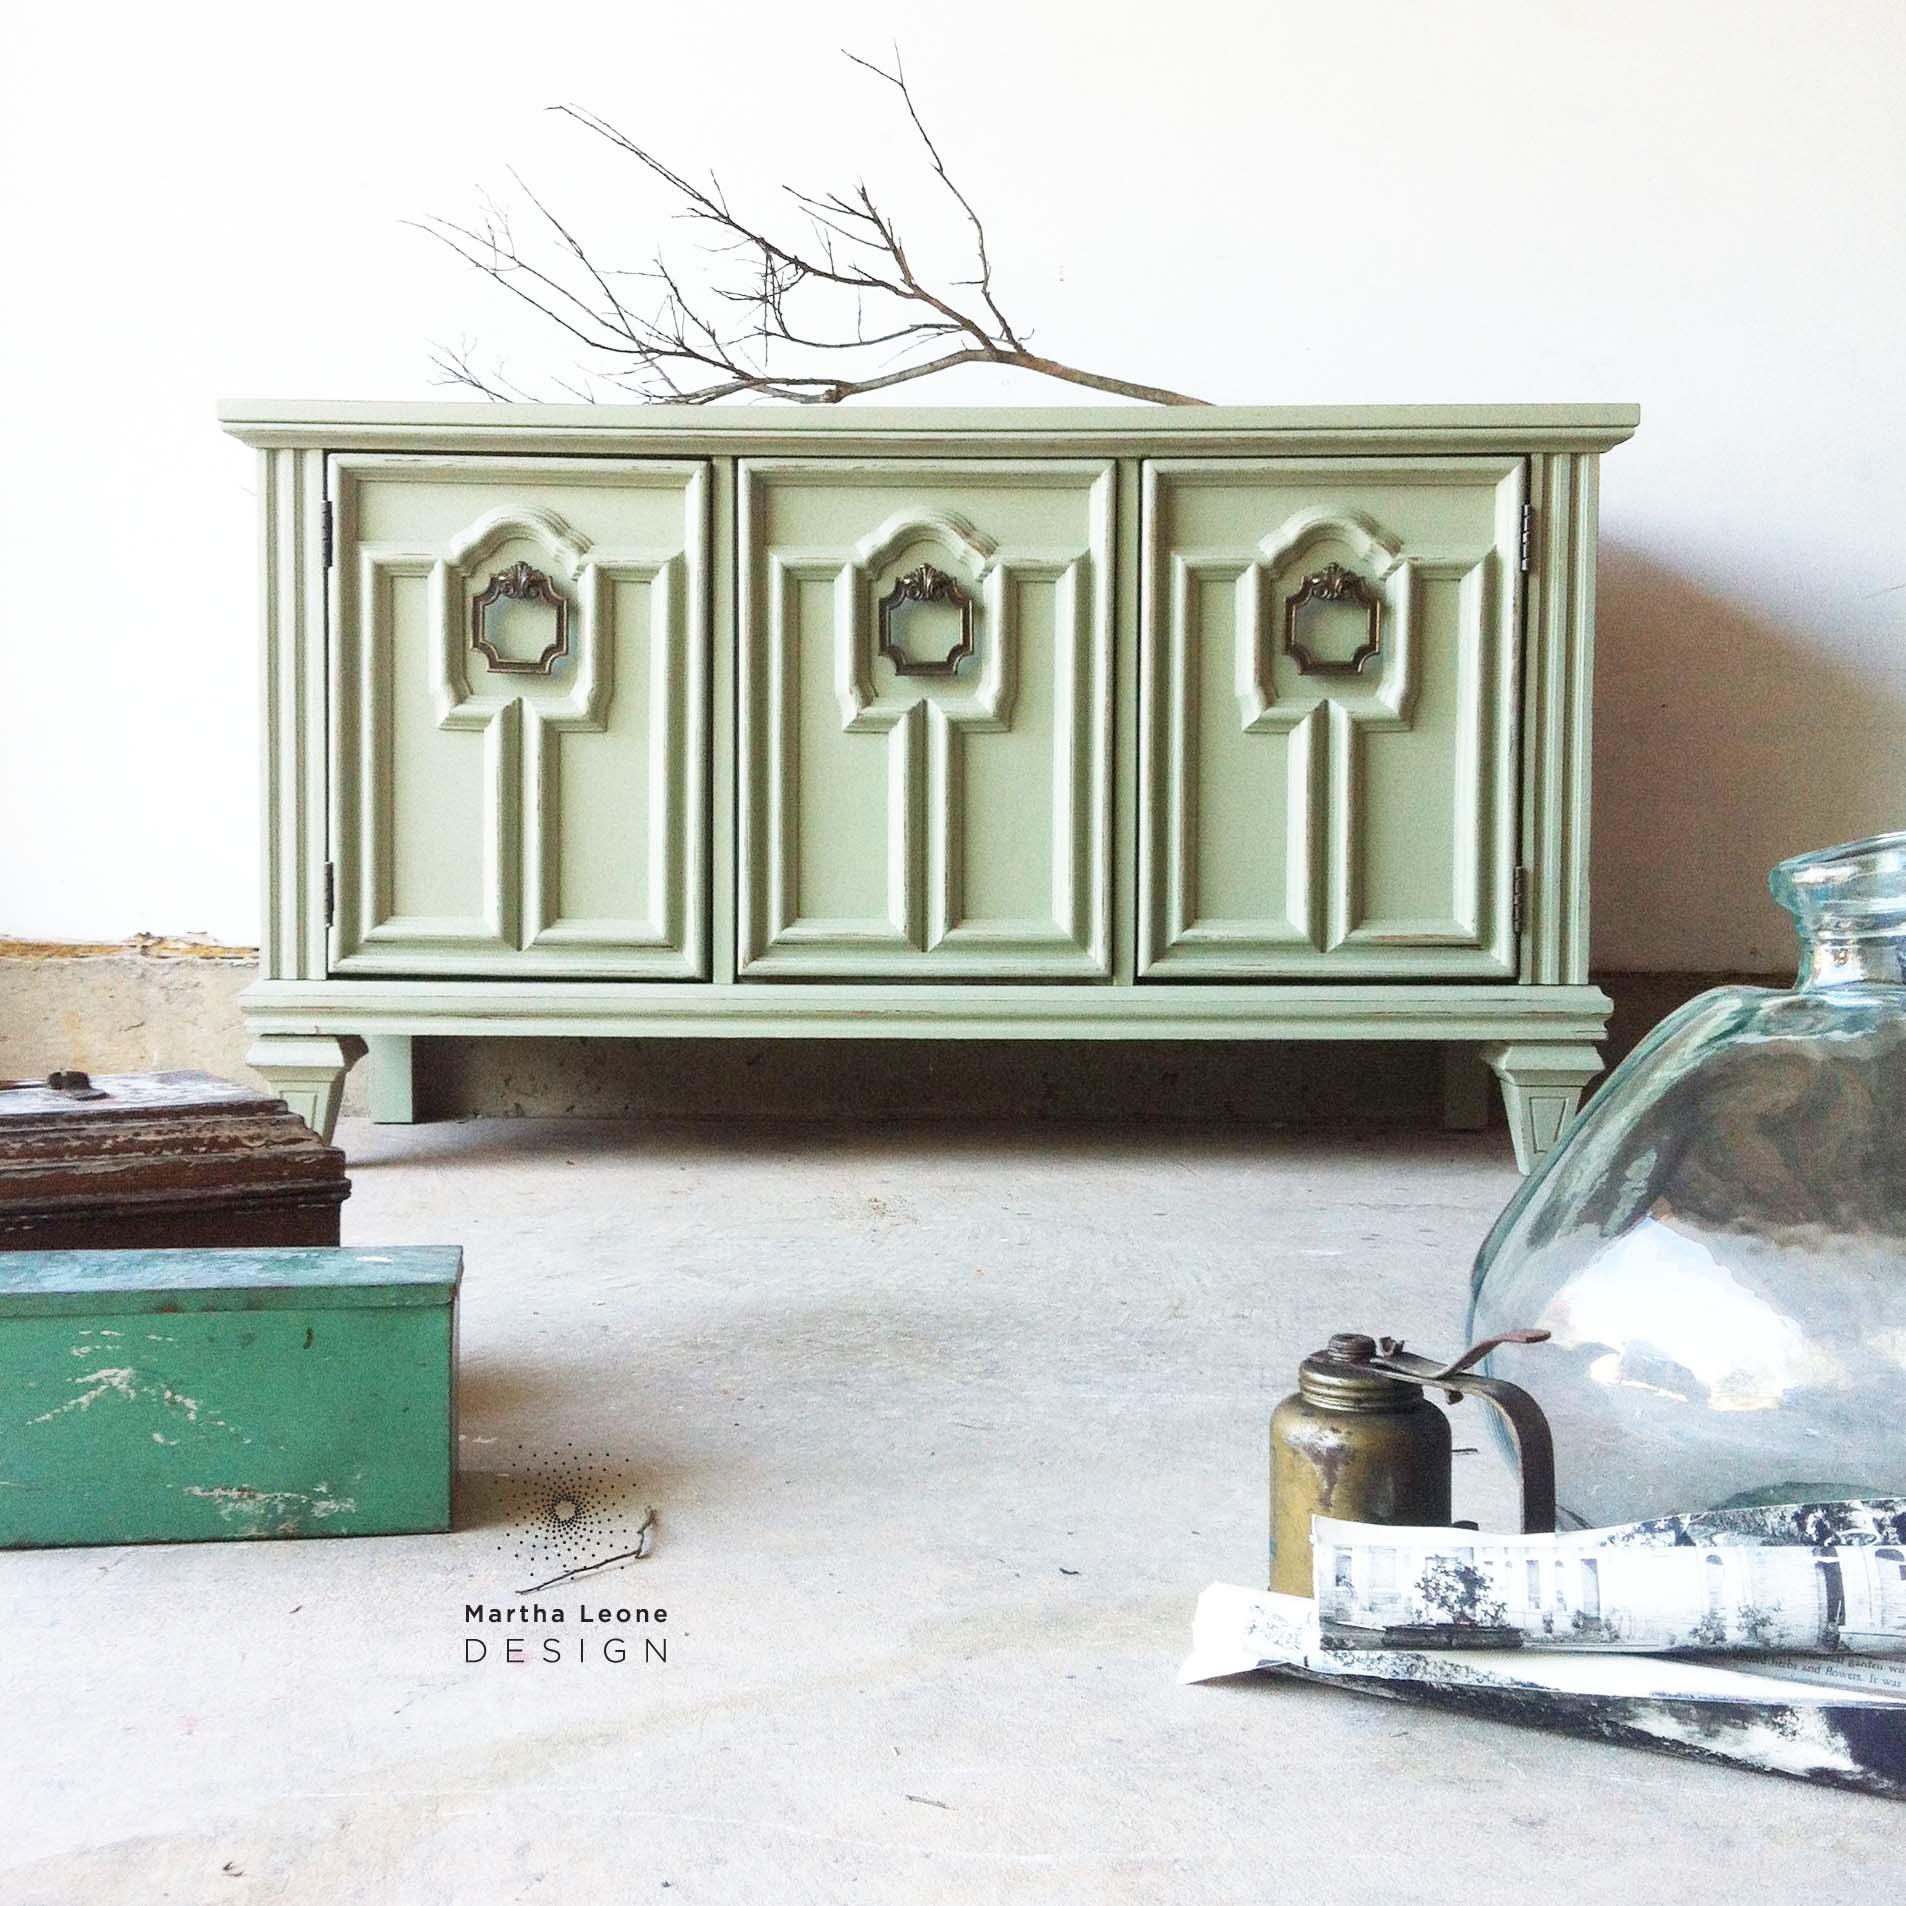 Green Cabinet3 Martha Leone Design.jpg